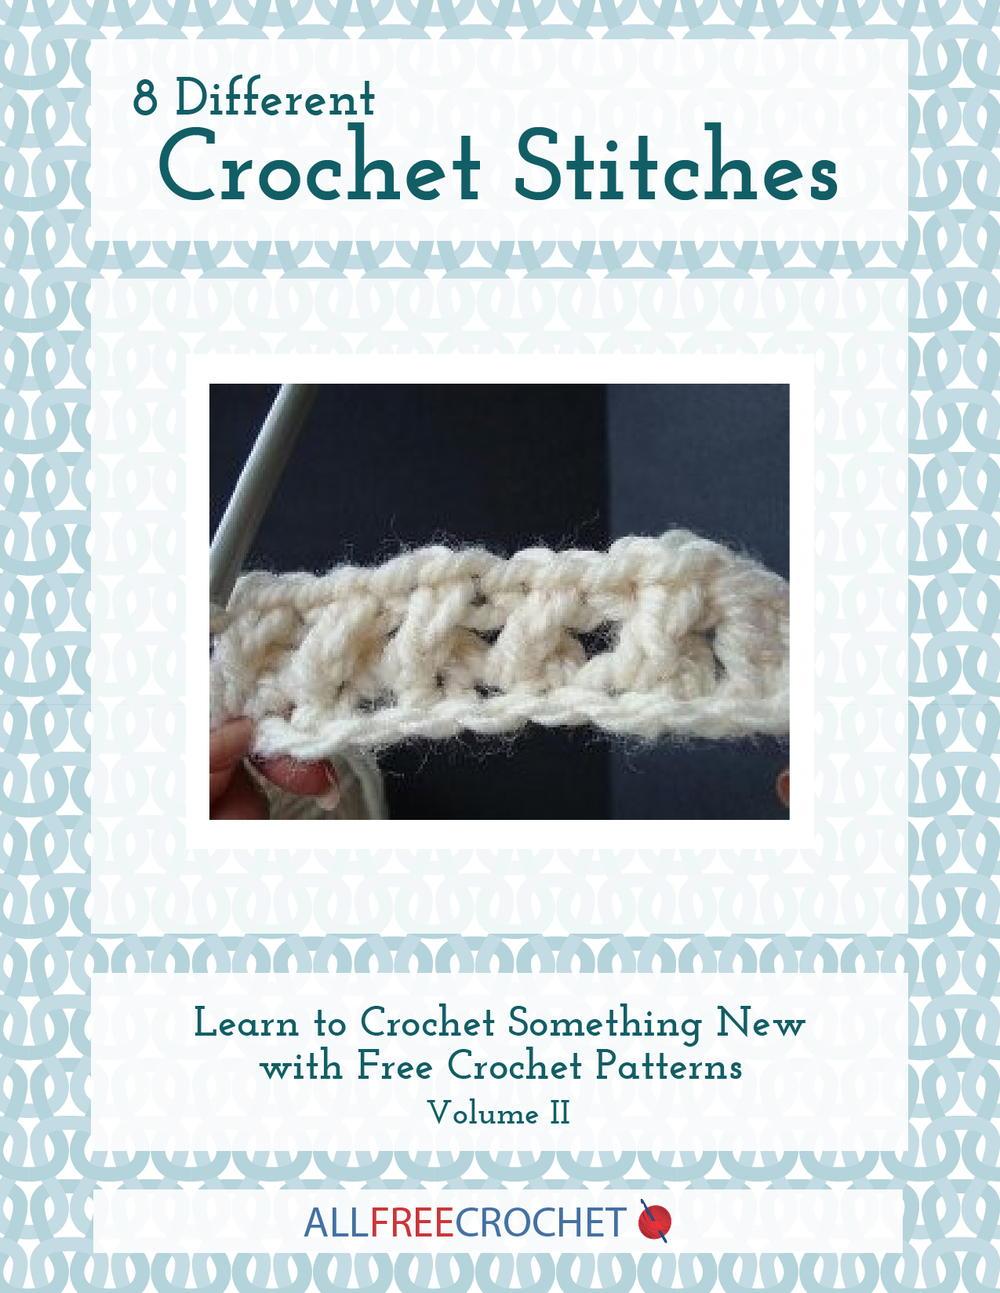 8 Different Crochet Stitches Volume Ii Allfreecrochet Com